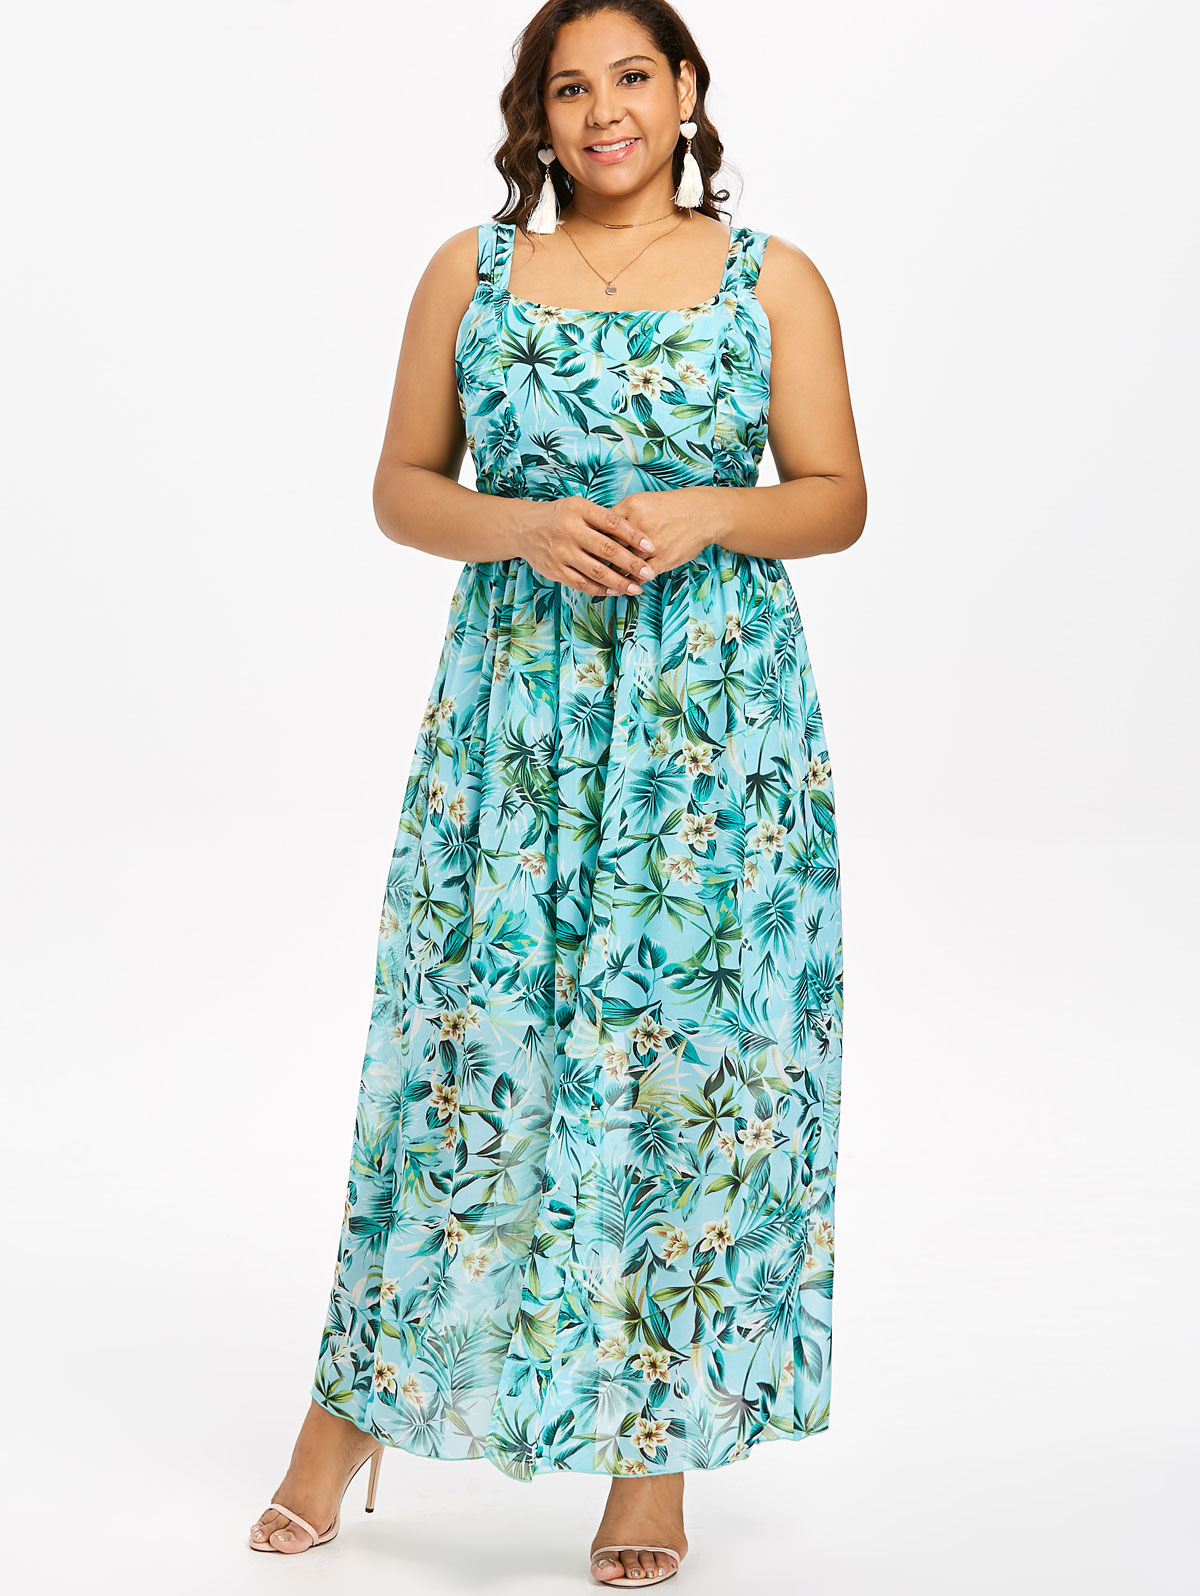 Wipalo Plus Size 5XL Sleeveless Maxi Hawaiian Dress Front Split Floral  Print Dress High Waist Flowing Holiday Dress Vestidos-in Dresses from  Women s ... 7ff726fccc2b